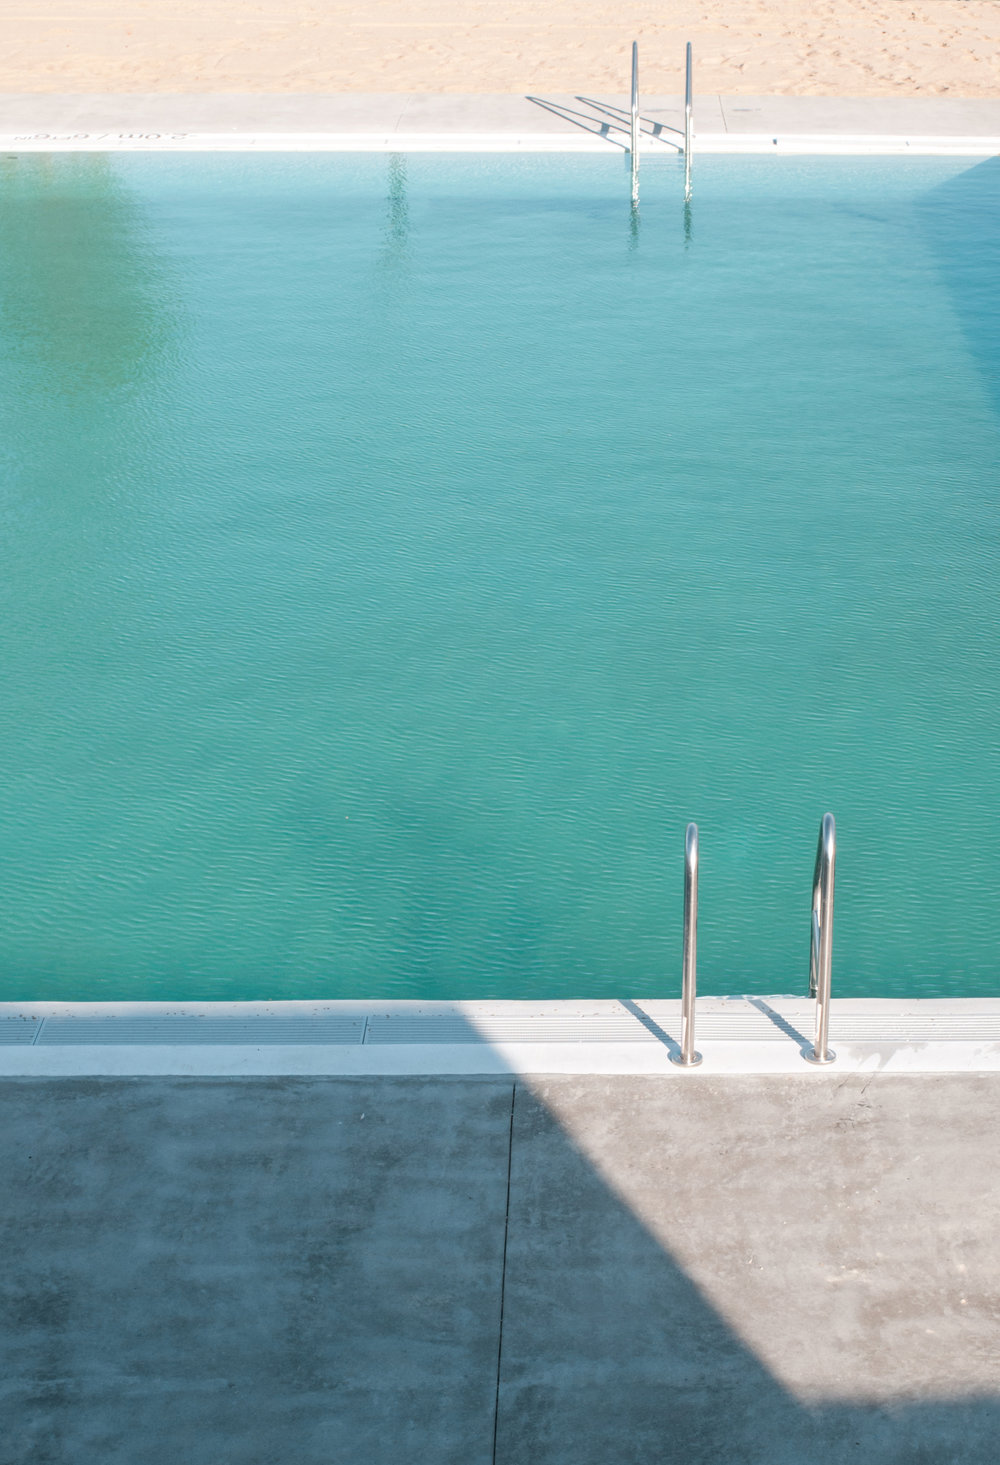 gh3 - Borden Park Natural Swimming Pool - Pool aerial